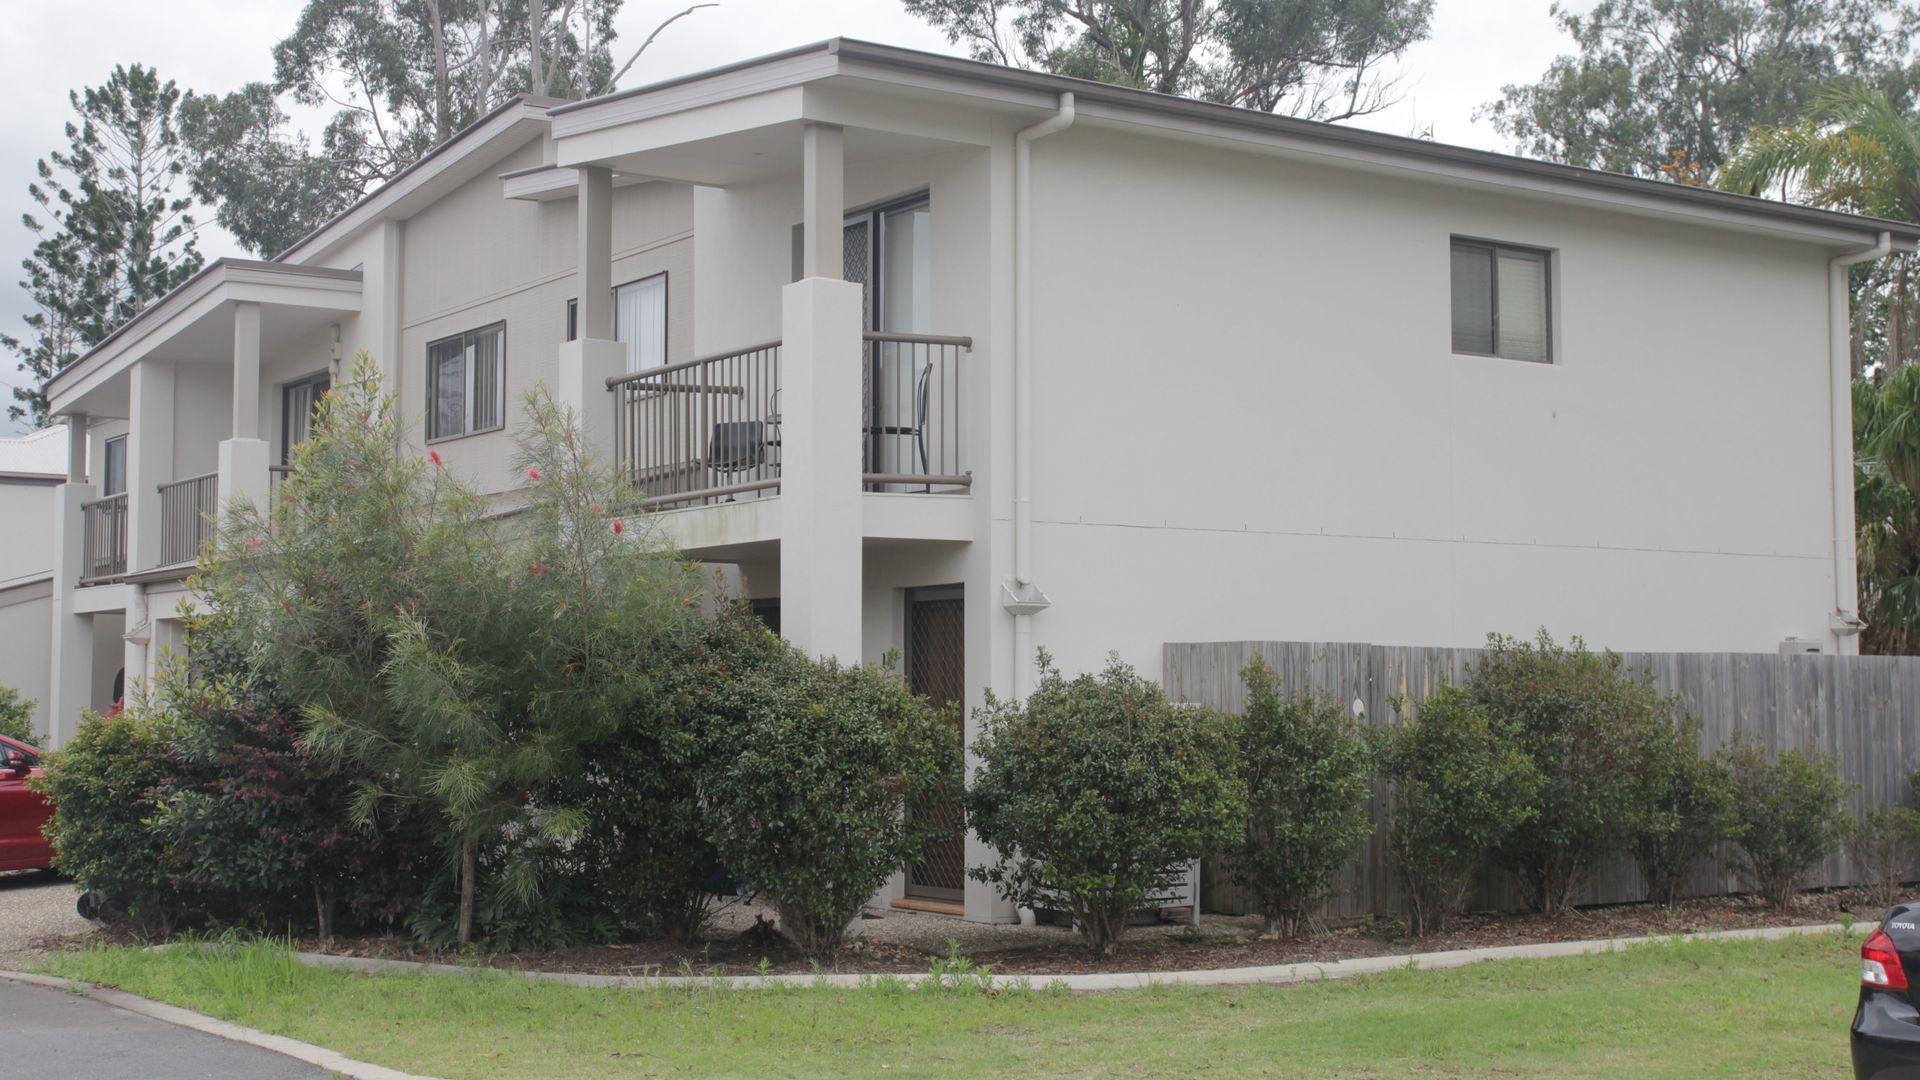 7/350 BENHIAM STREET, Calamvale QLD 4116, Image 2